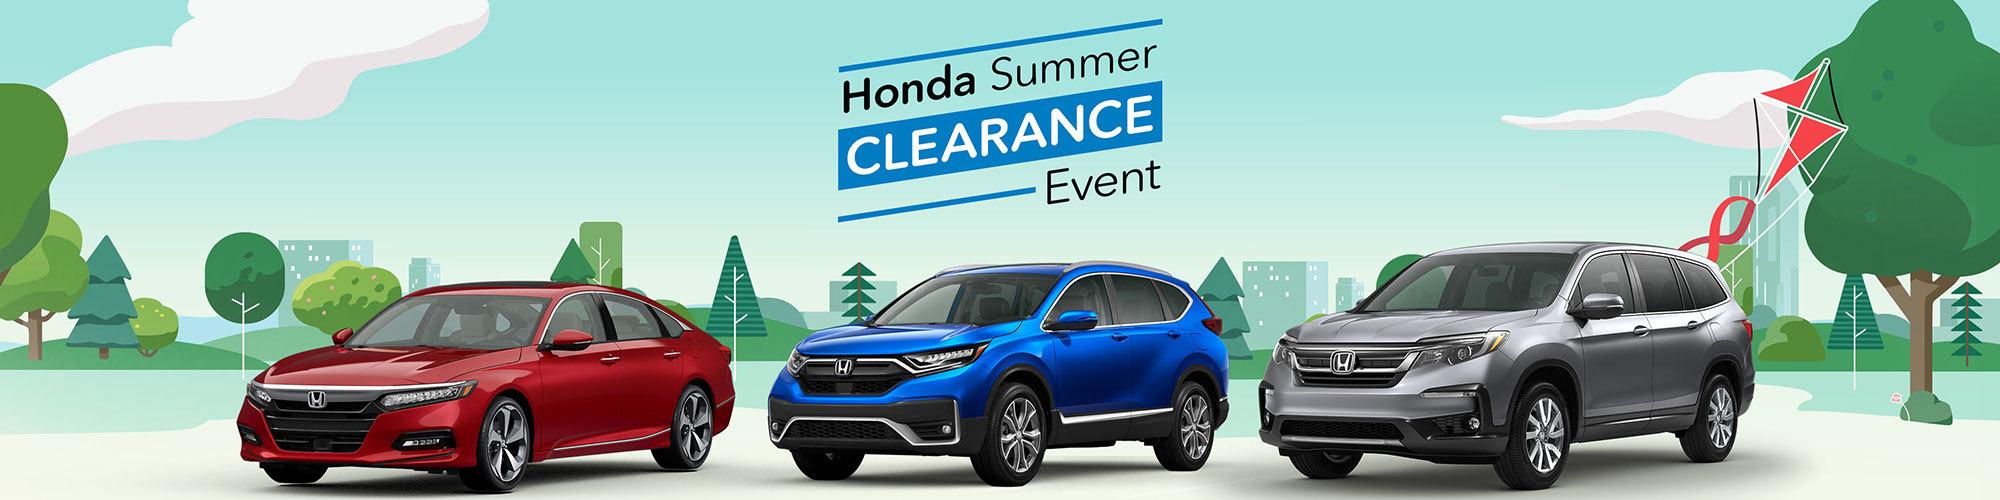 Honda Summer Clearance Event 2020